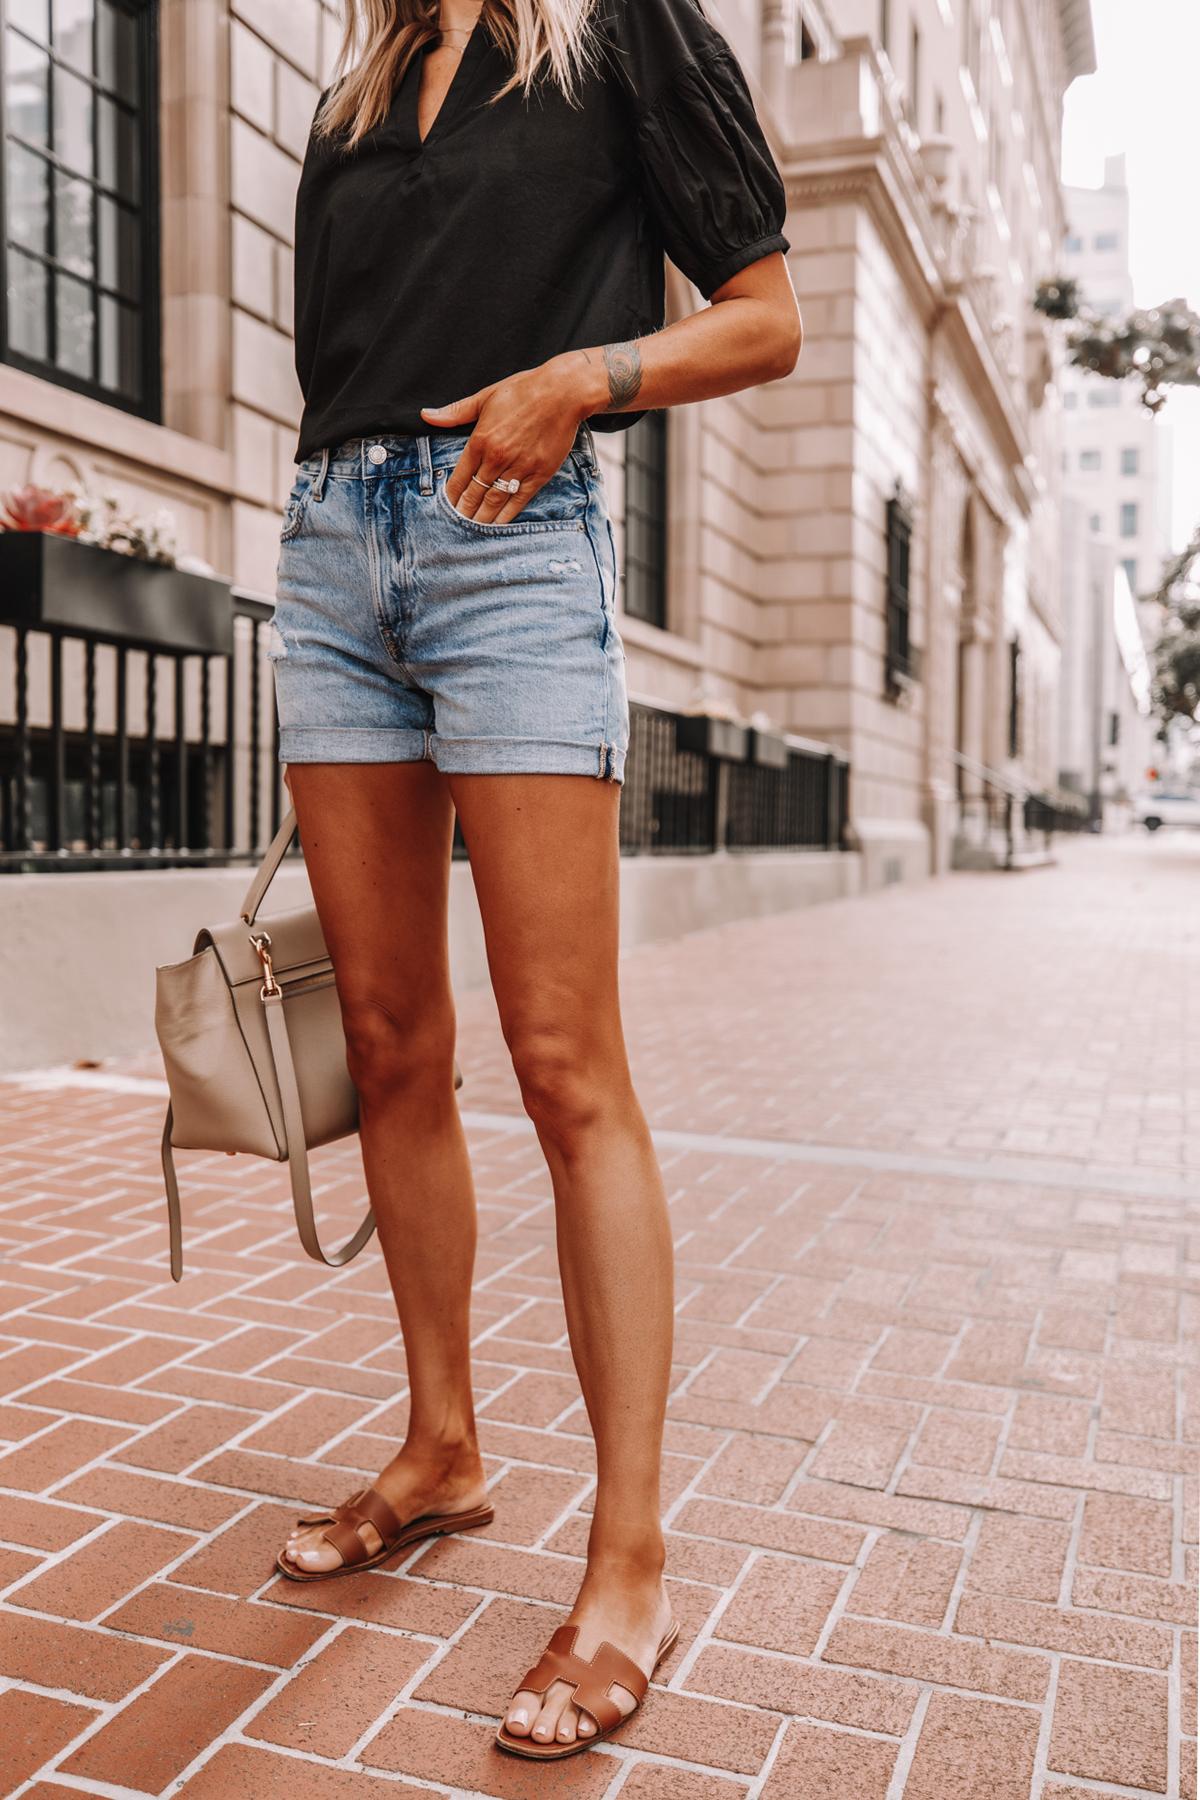 Fashion Jackson Wearing Black Everlane Split Neck Puff Sleeve Air Shirt Everlane Denim Shorts Tan Sandals Summer Outfit